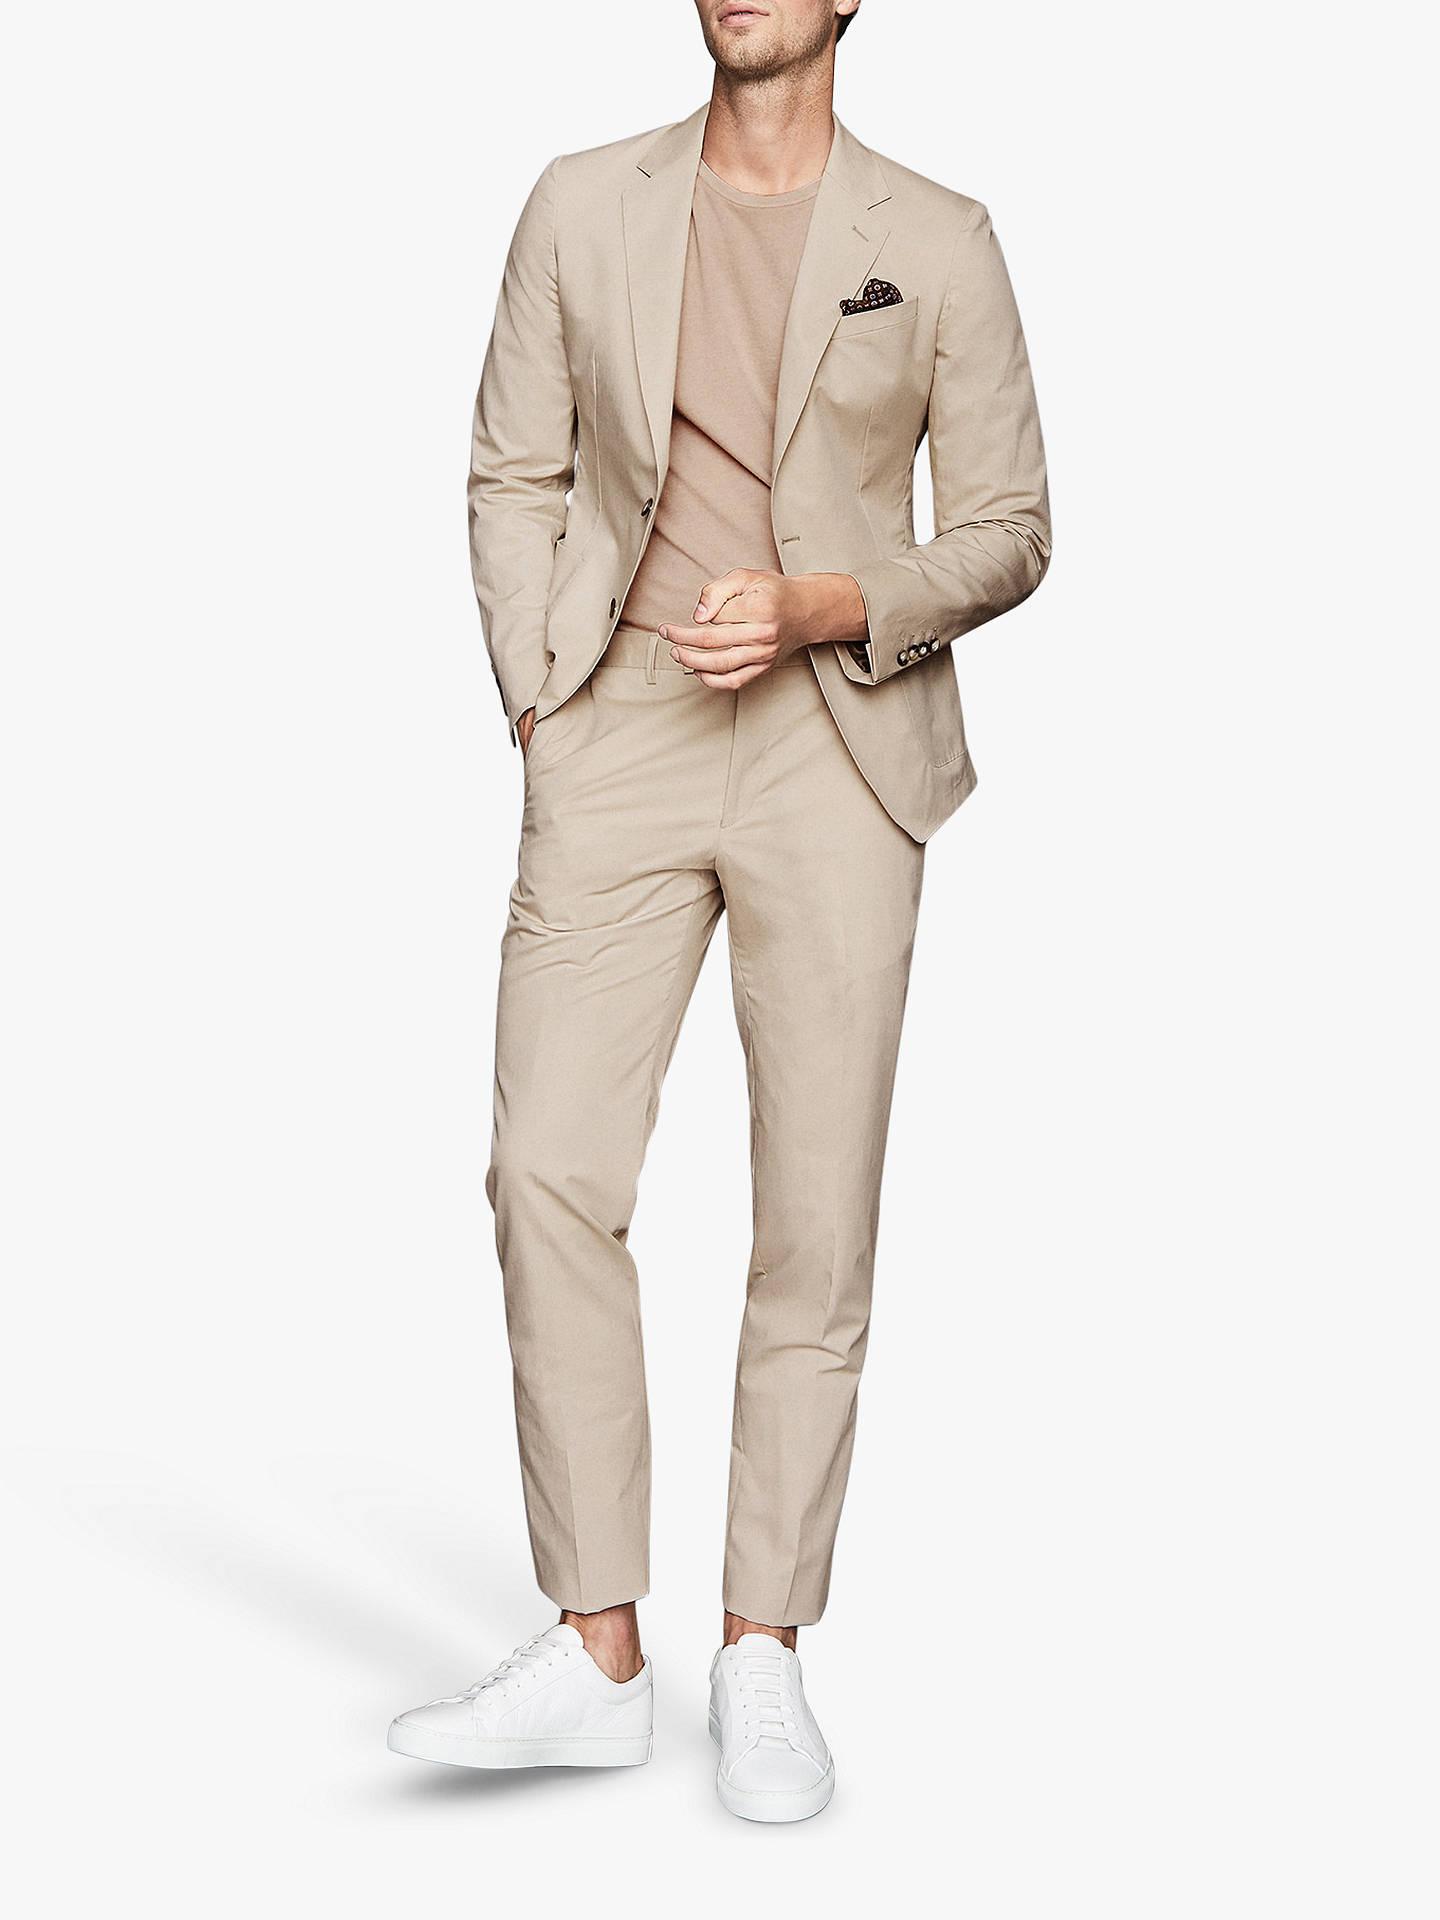 classic fit best authentic best authentic Reiss Scholar Tailored Fit Suit Jacket, Stone at John Lewis ...